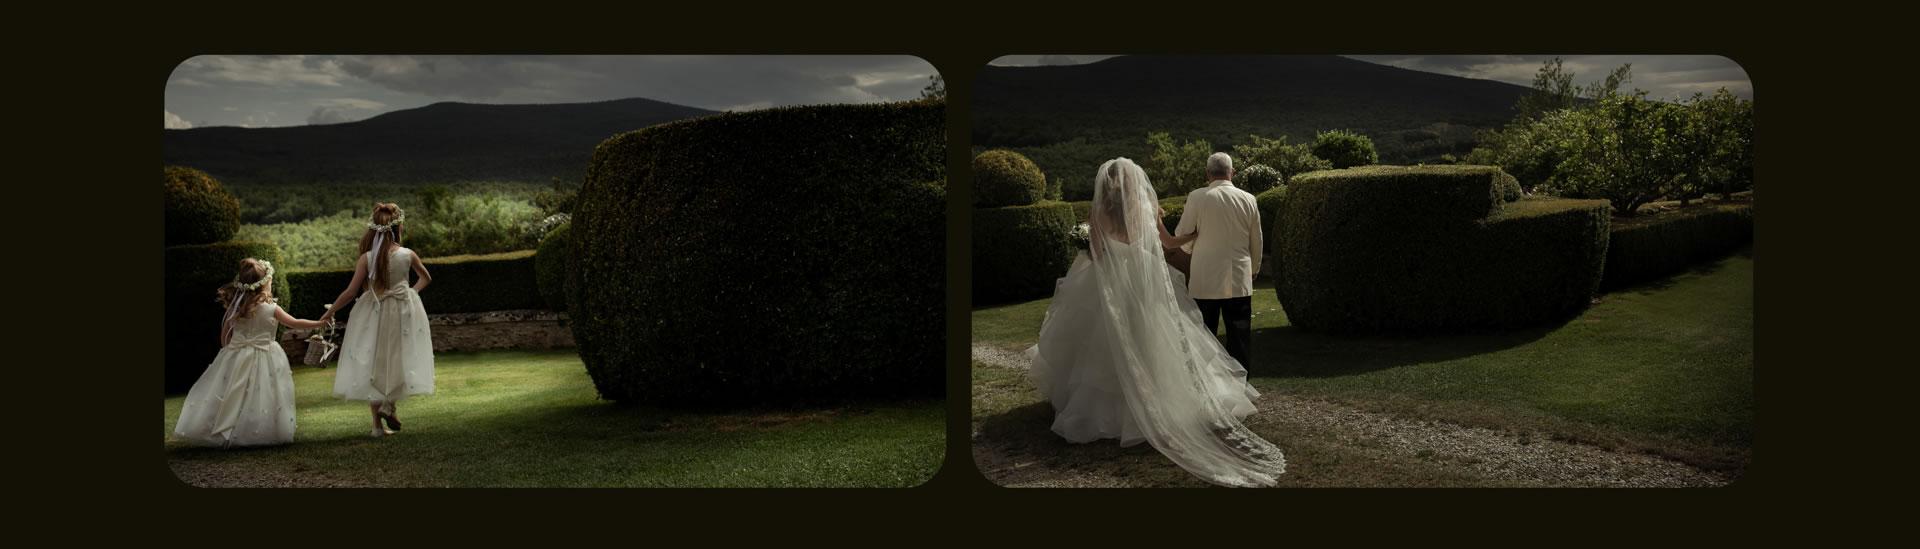 borgo-stomennano-david-bastianoni-photographer-00020 - 20 :: Wedding at Borgo Stomennano // WPPI 2018 // Our love is here to stay :: Luxury wedding photography - 19 :: borgo-stomennano-david-bastianoni-photographer-00020 - 20